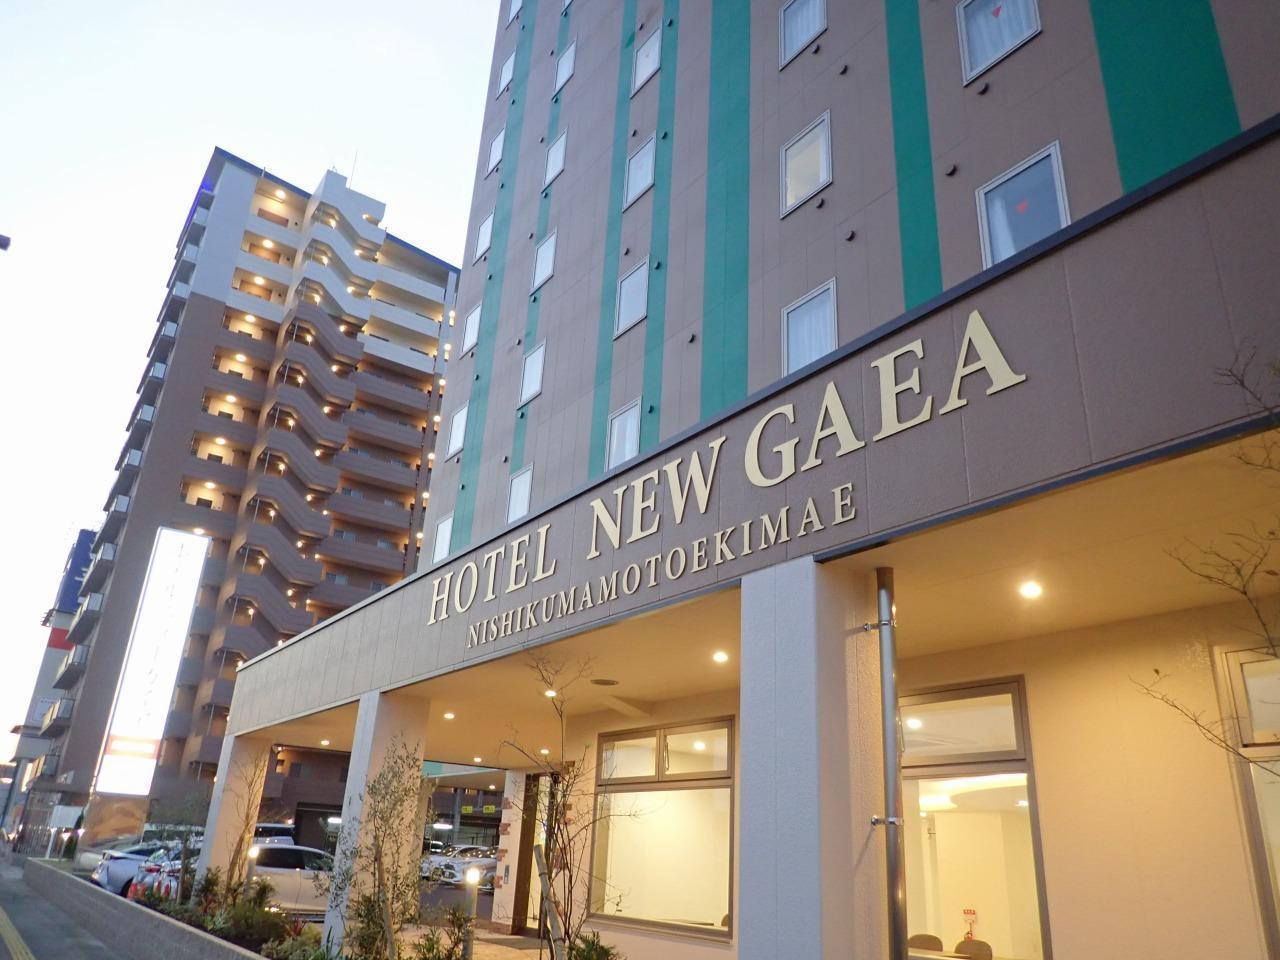 Hotel New Gaea Nishikumamoto Ekimae